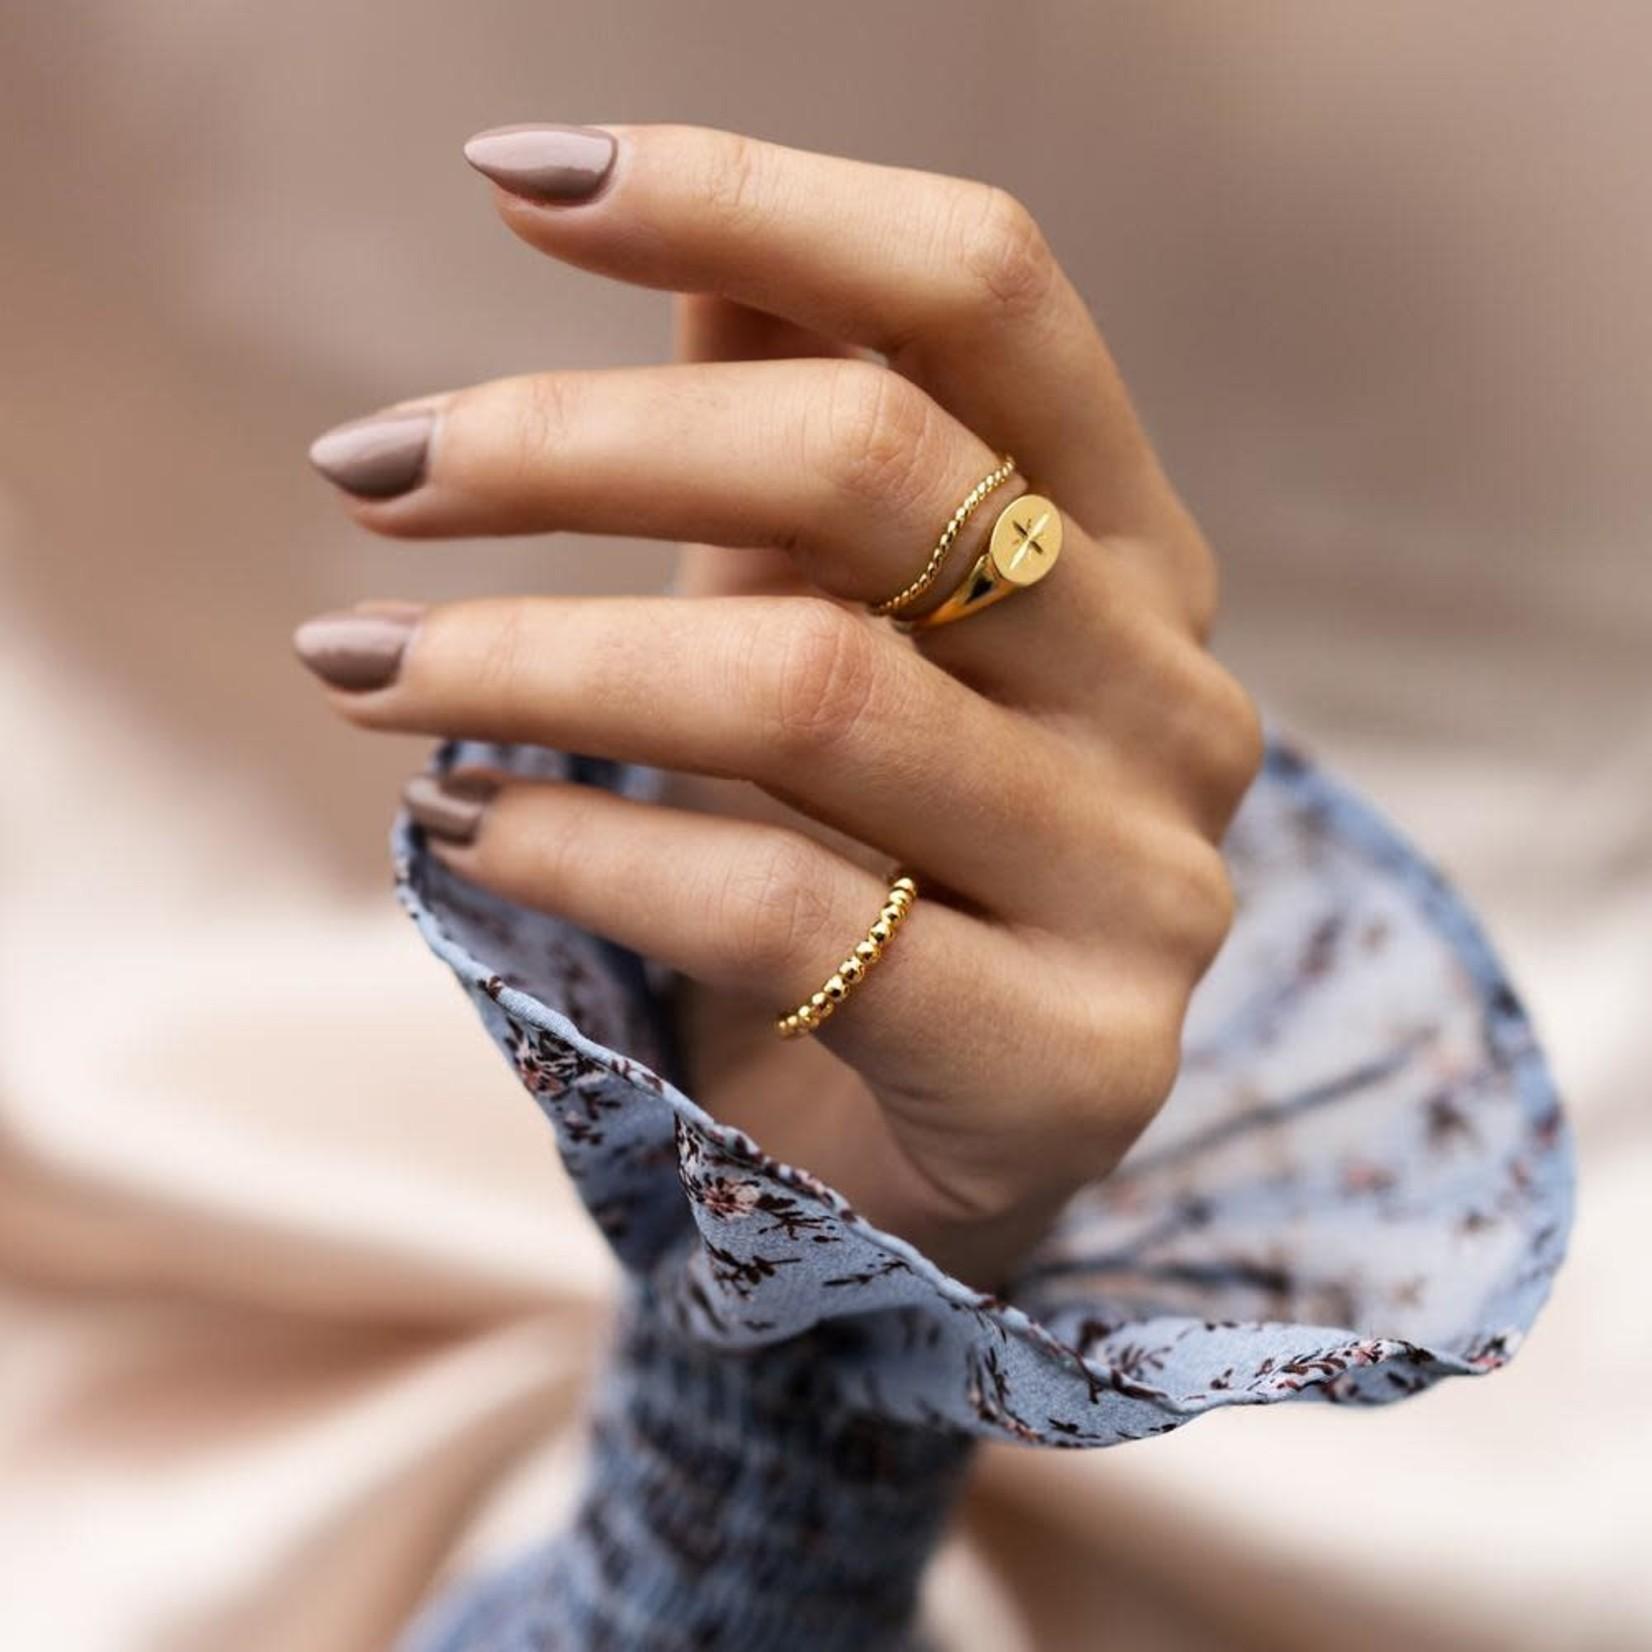 Welldunn jewelry Welldunn bague BABKA or